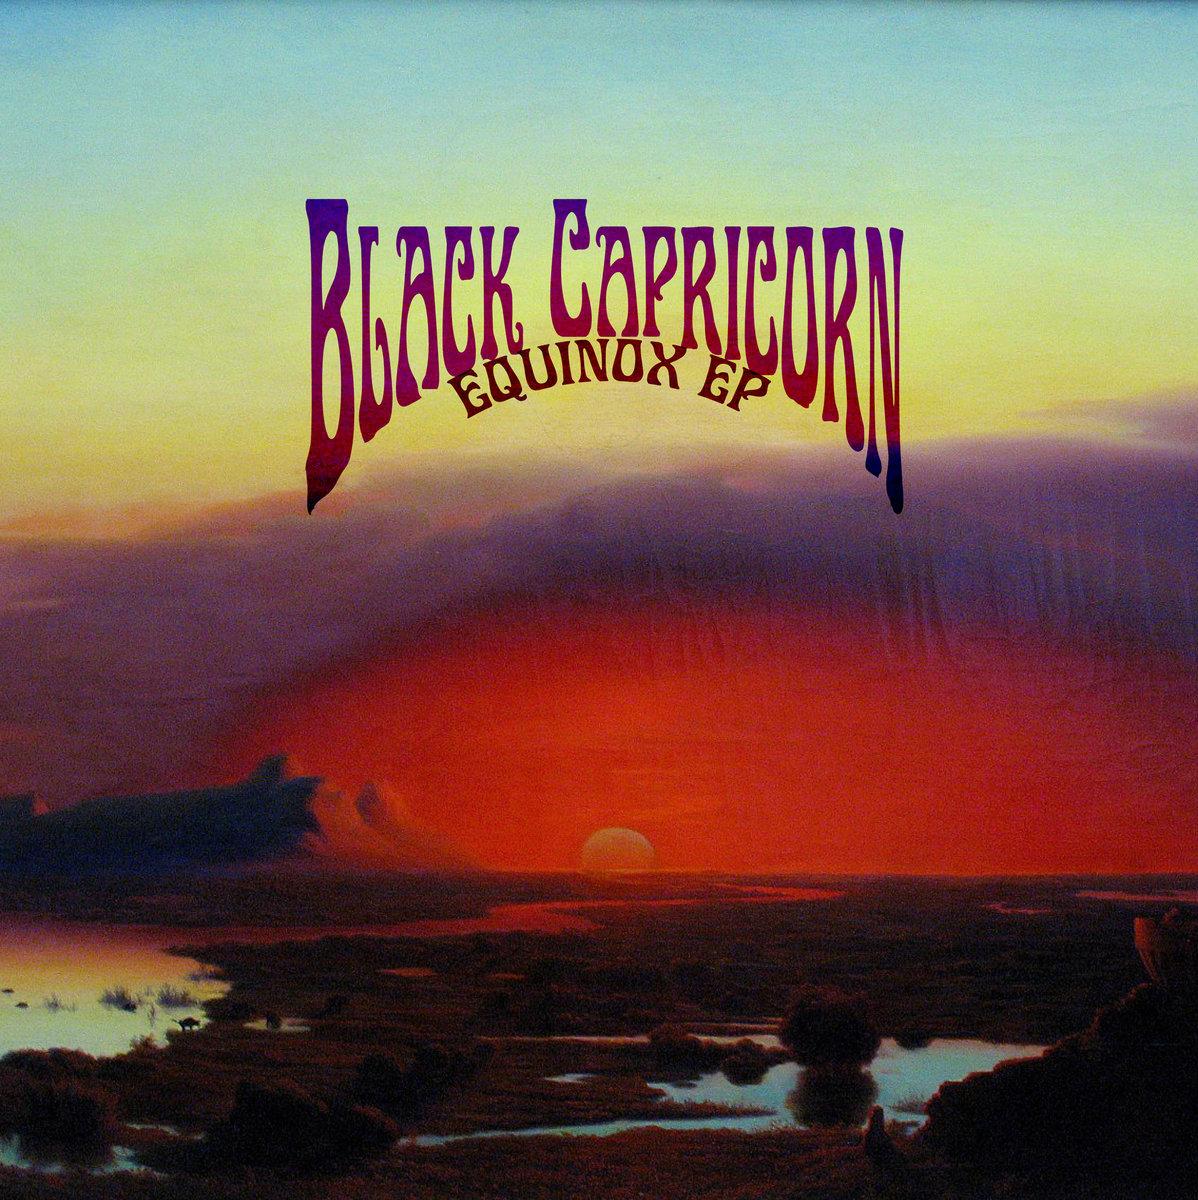 black-capricorn-equinox-ep